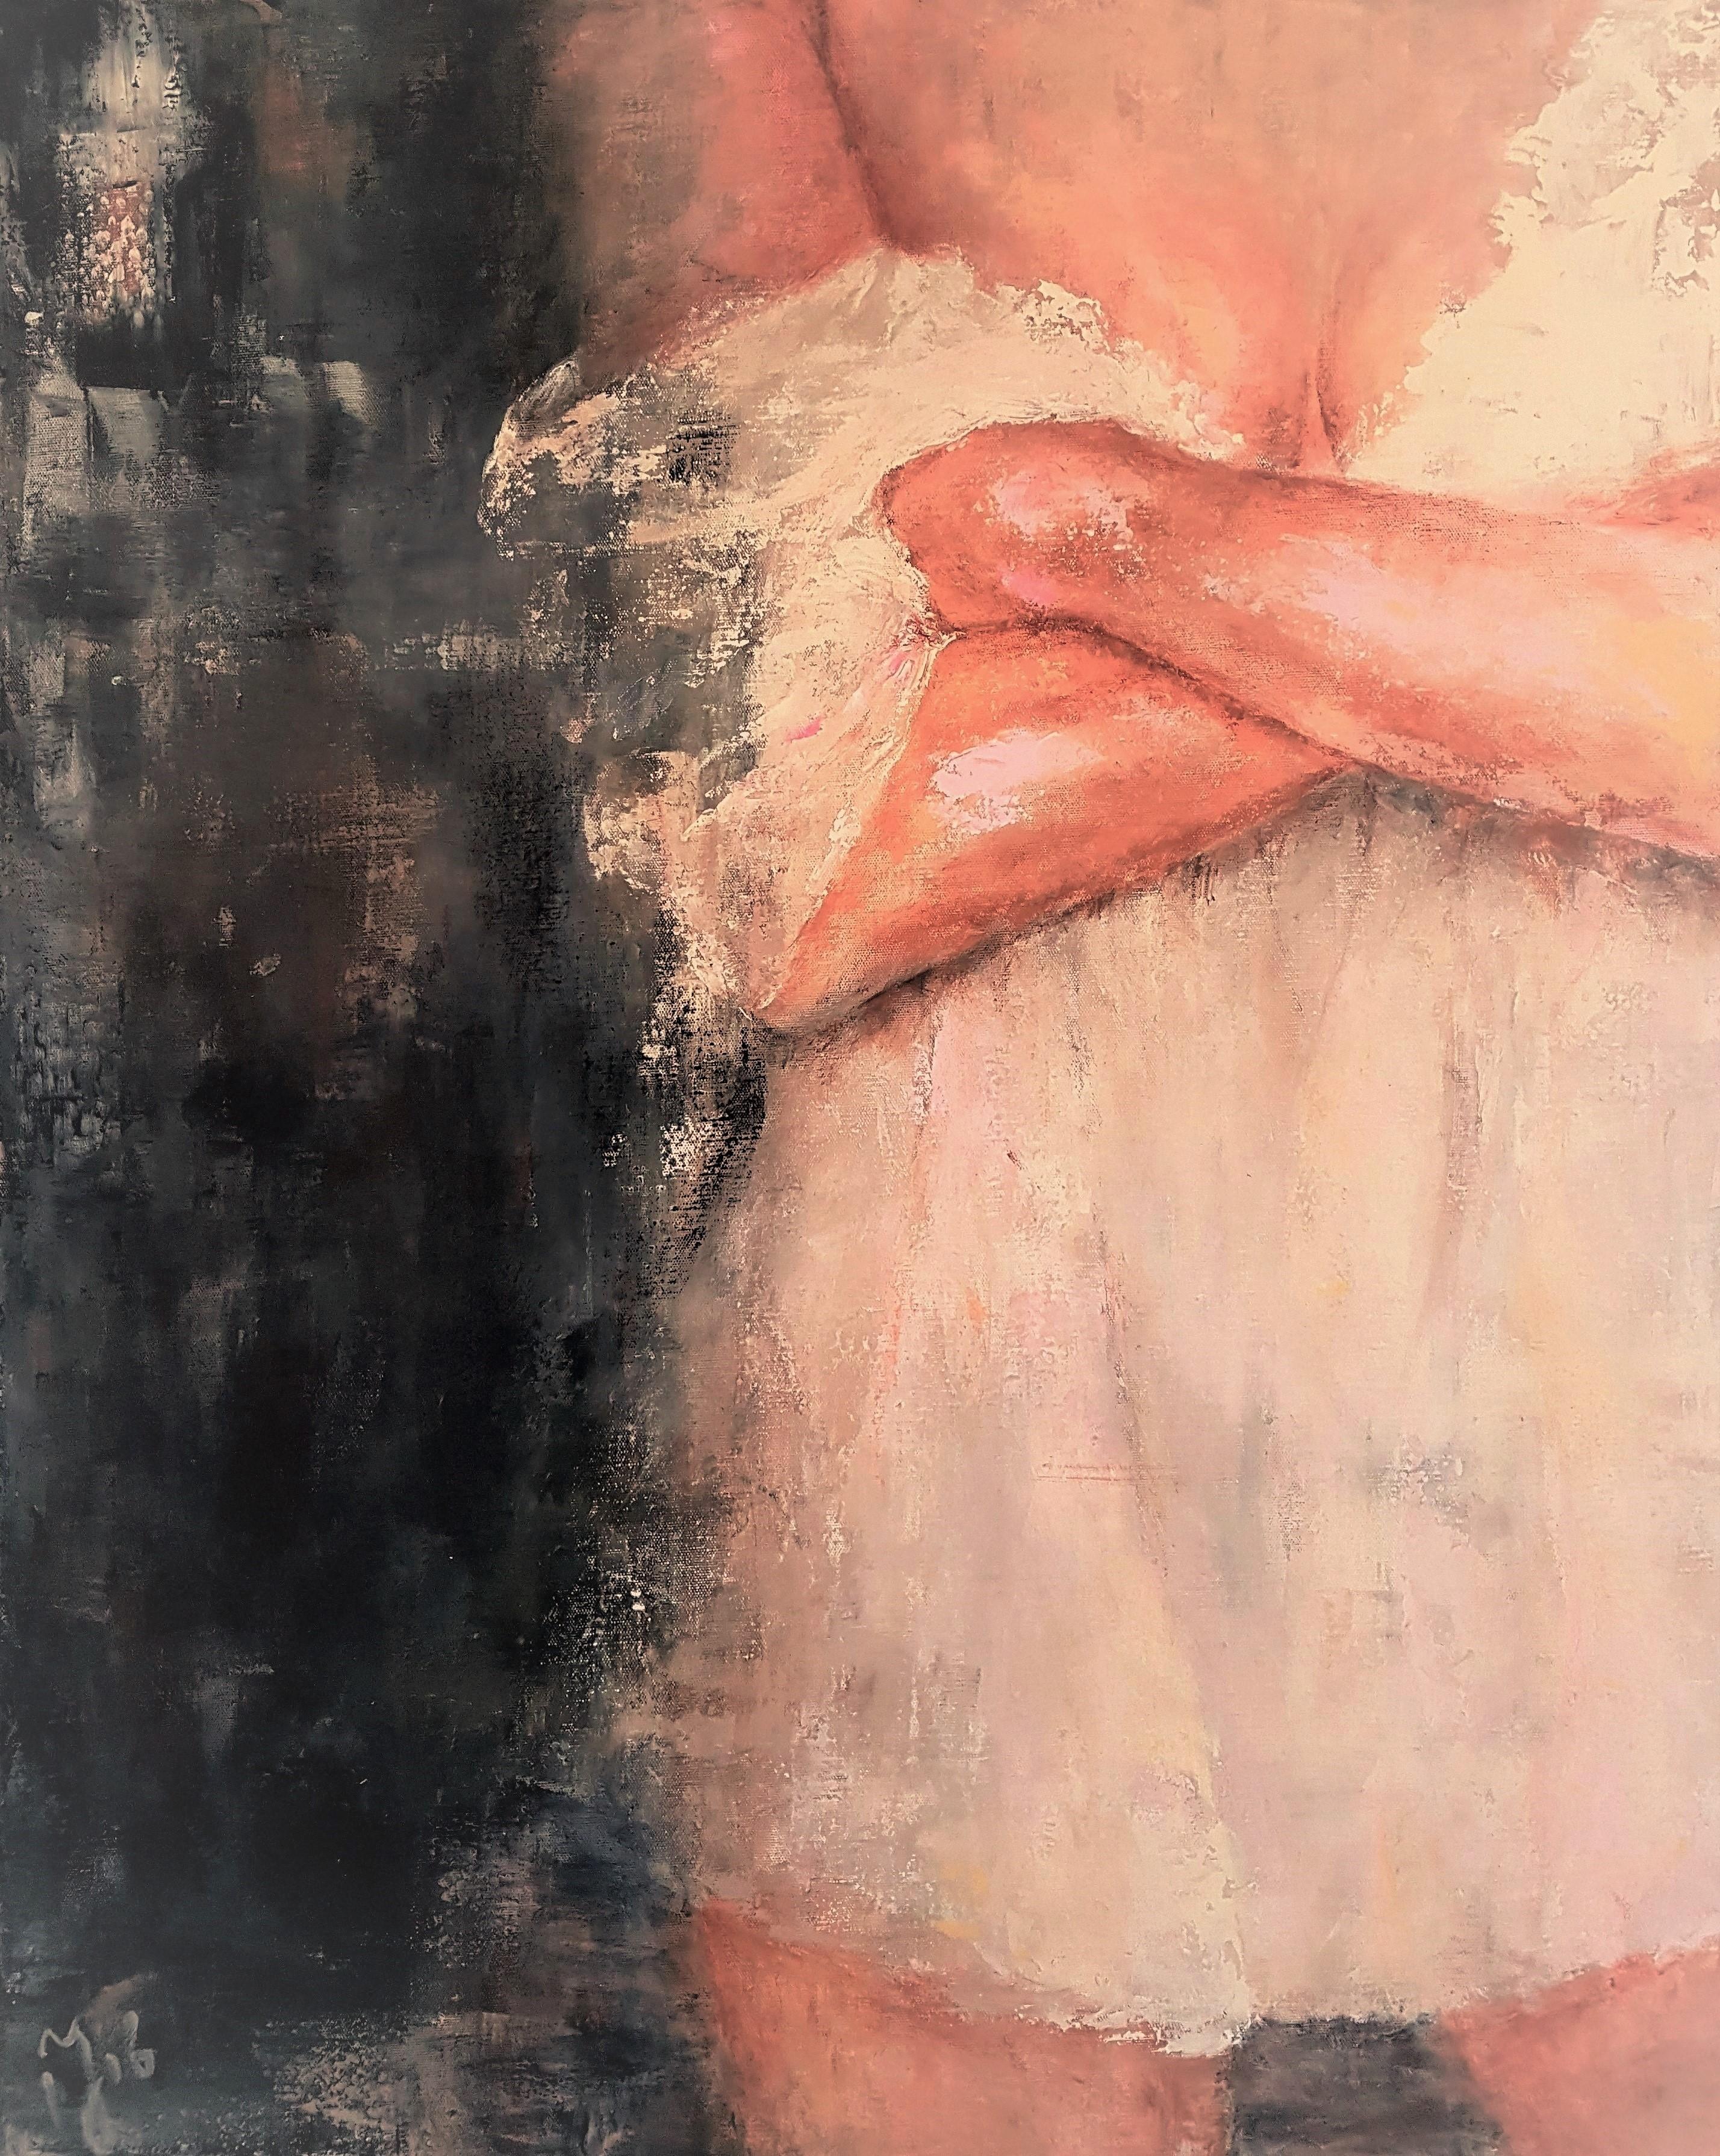 My Little White Dress | Overige | 80x100 | Linnen Aluminium Frame | Niet Meer Beschikbaar